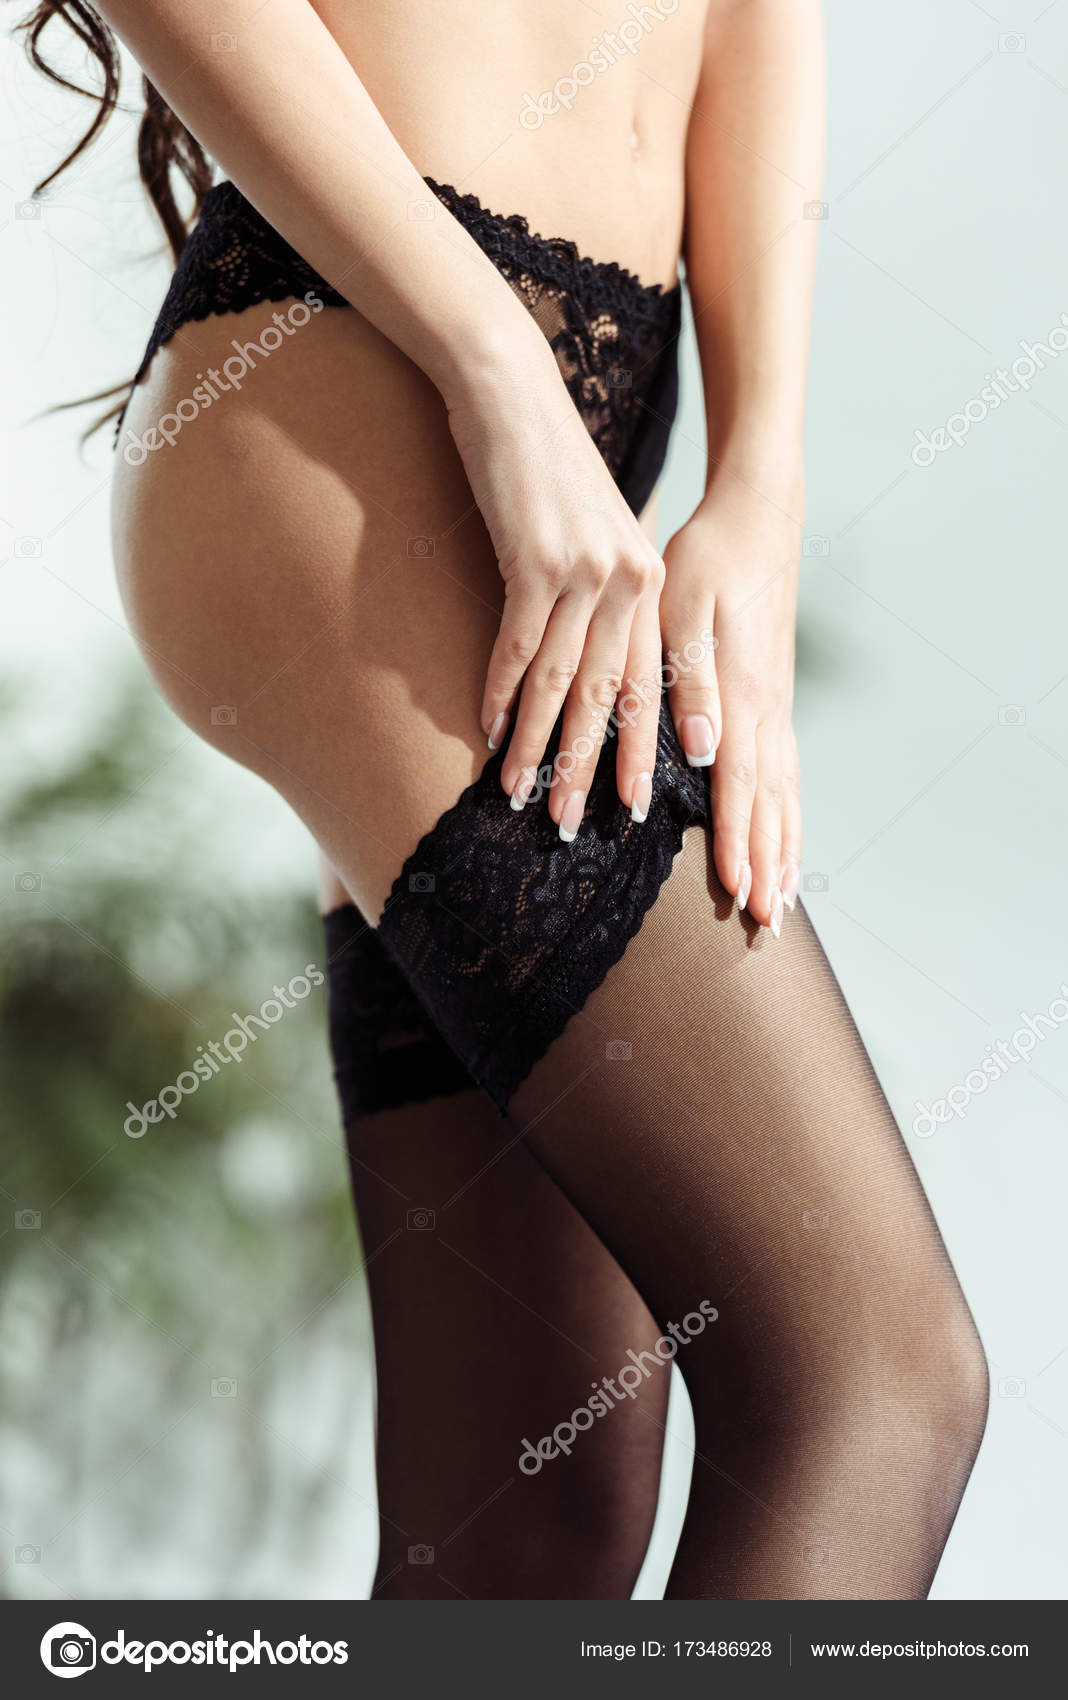 sexiga tjejer pictures.com